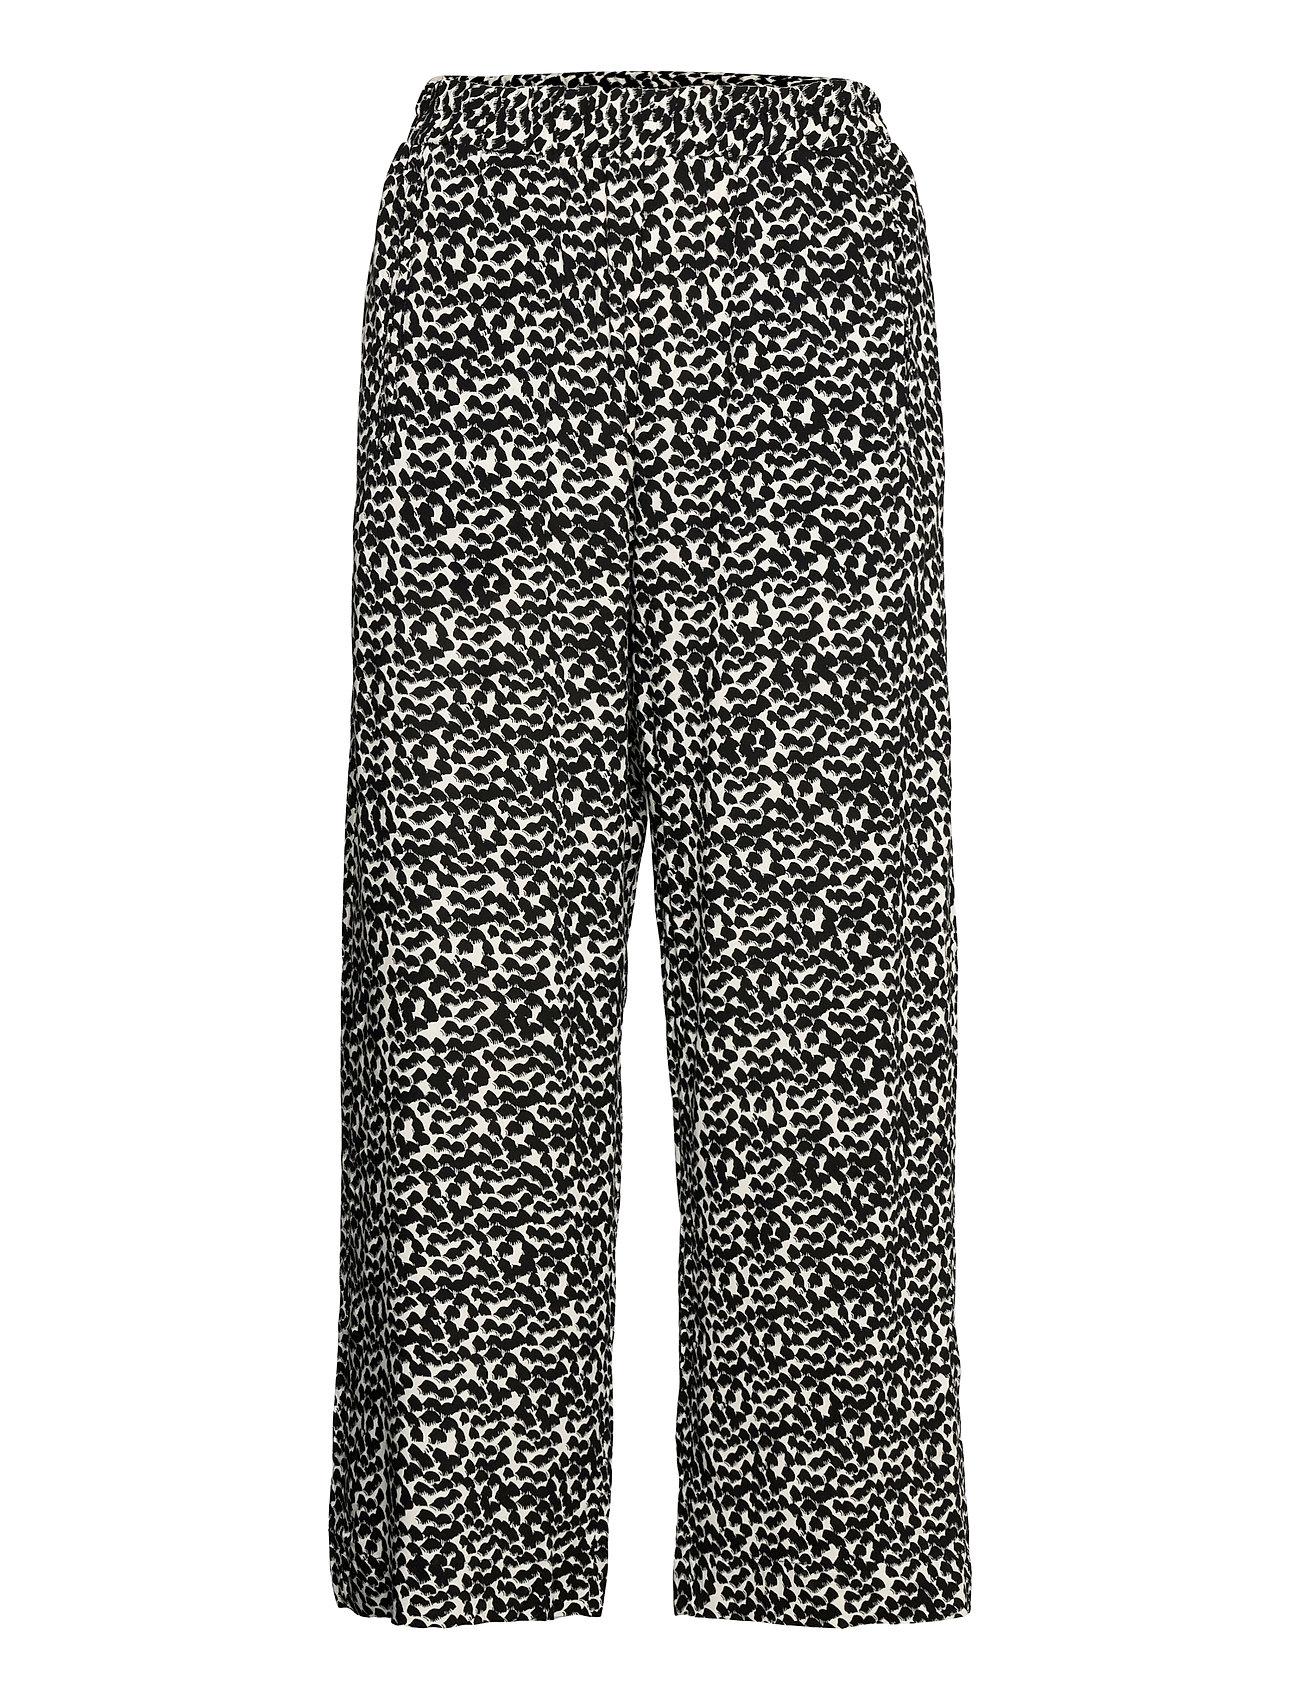 Trousers Bella Aop Casual Bukser Beige Lindex